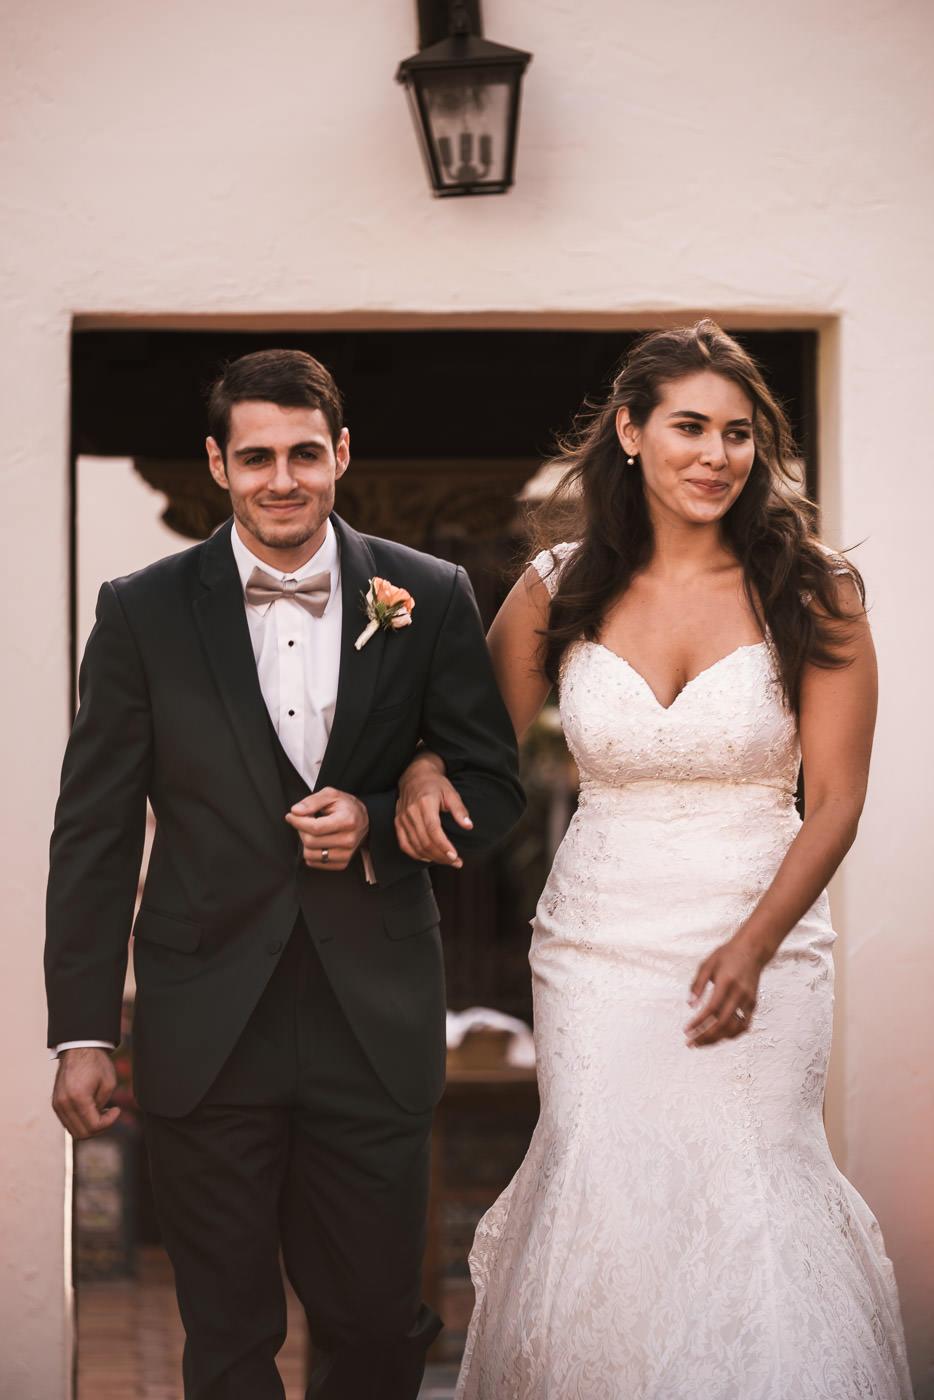 Newlyweds make their grand entrance at their Darlington House reception.